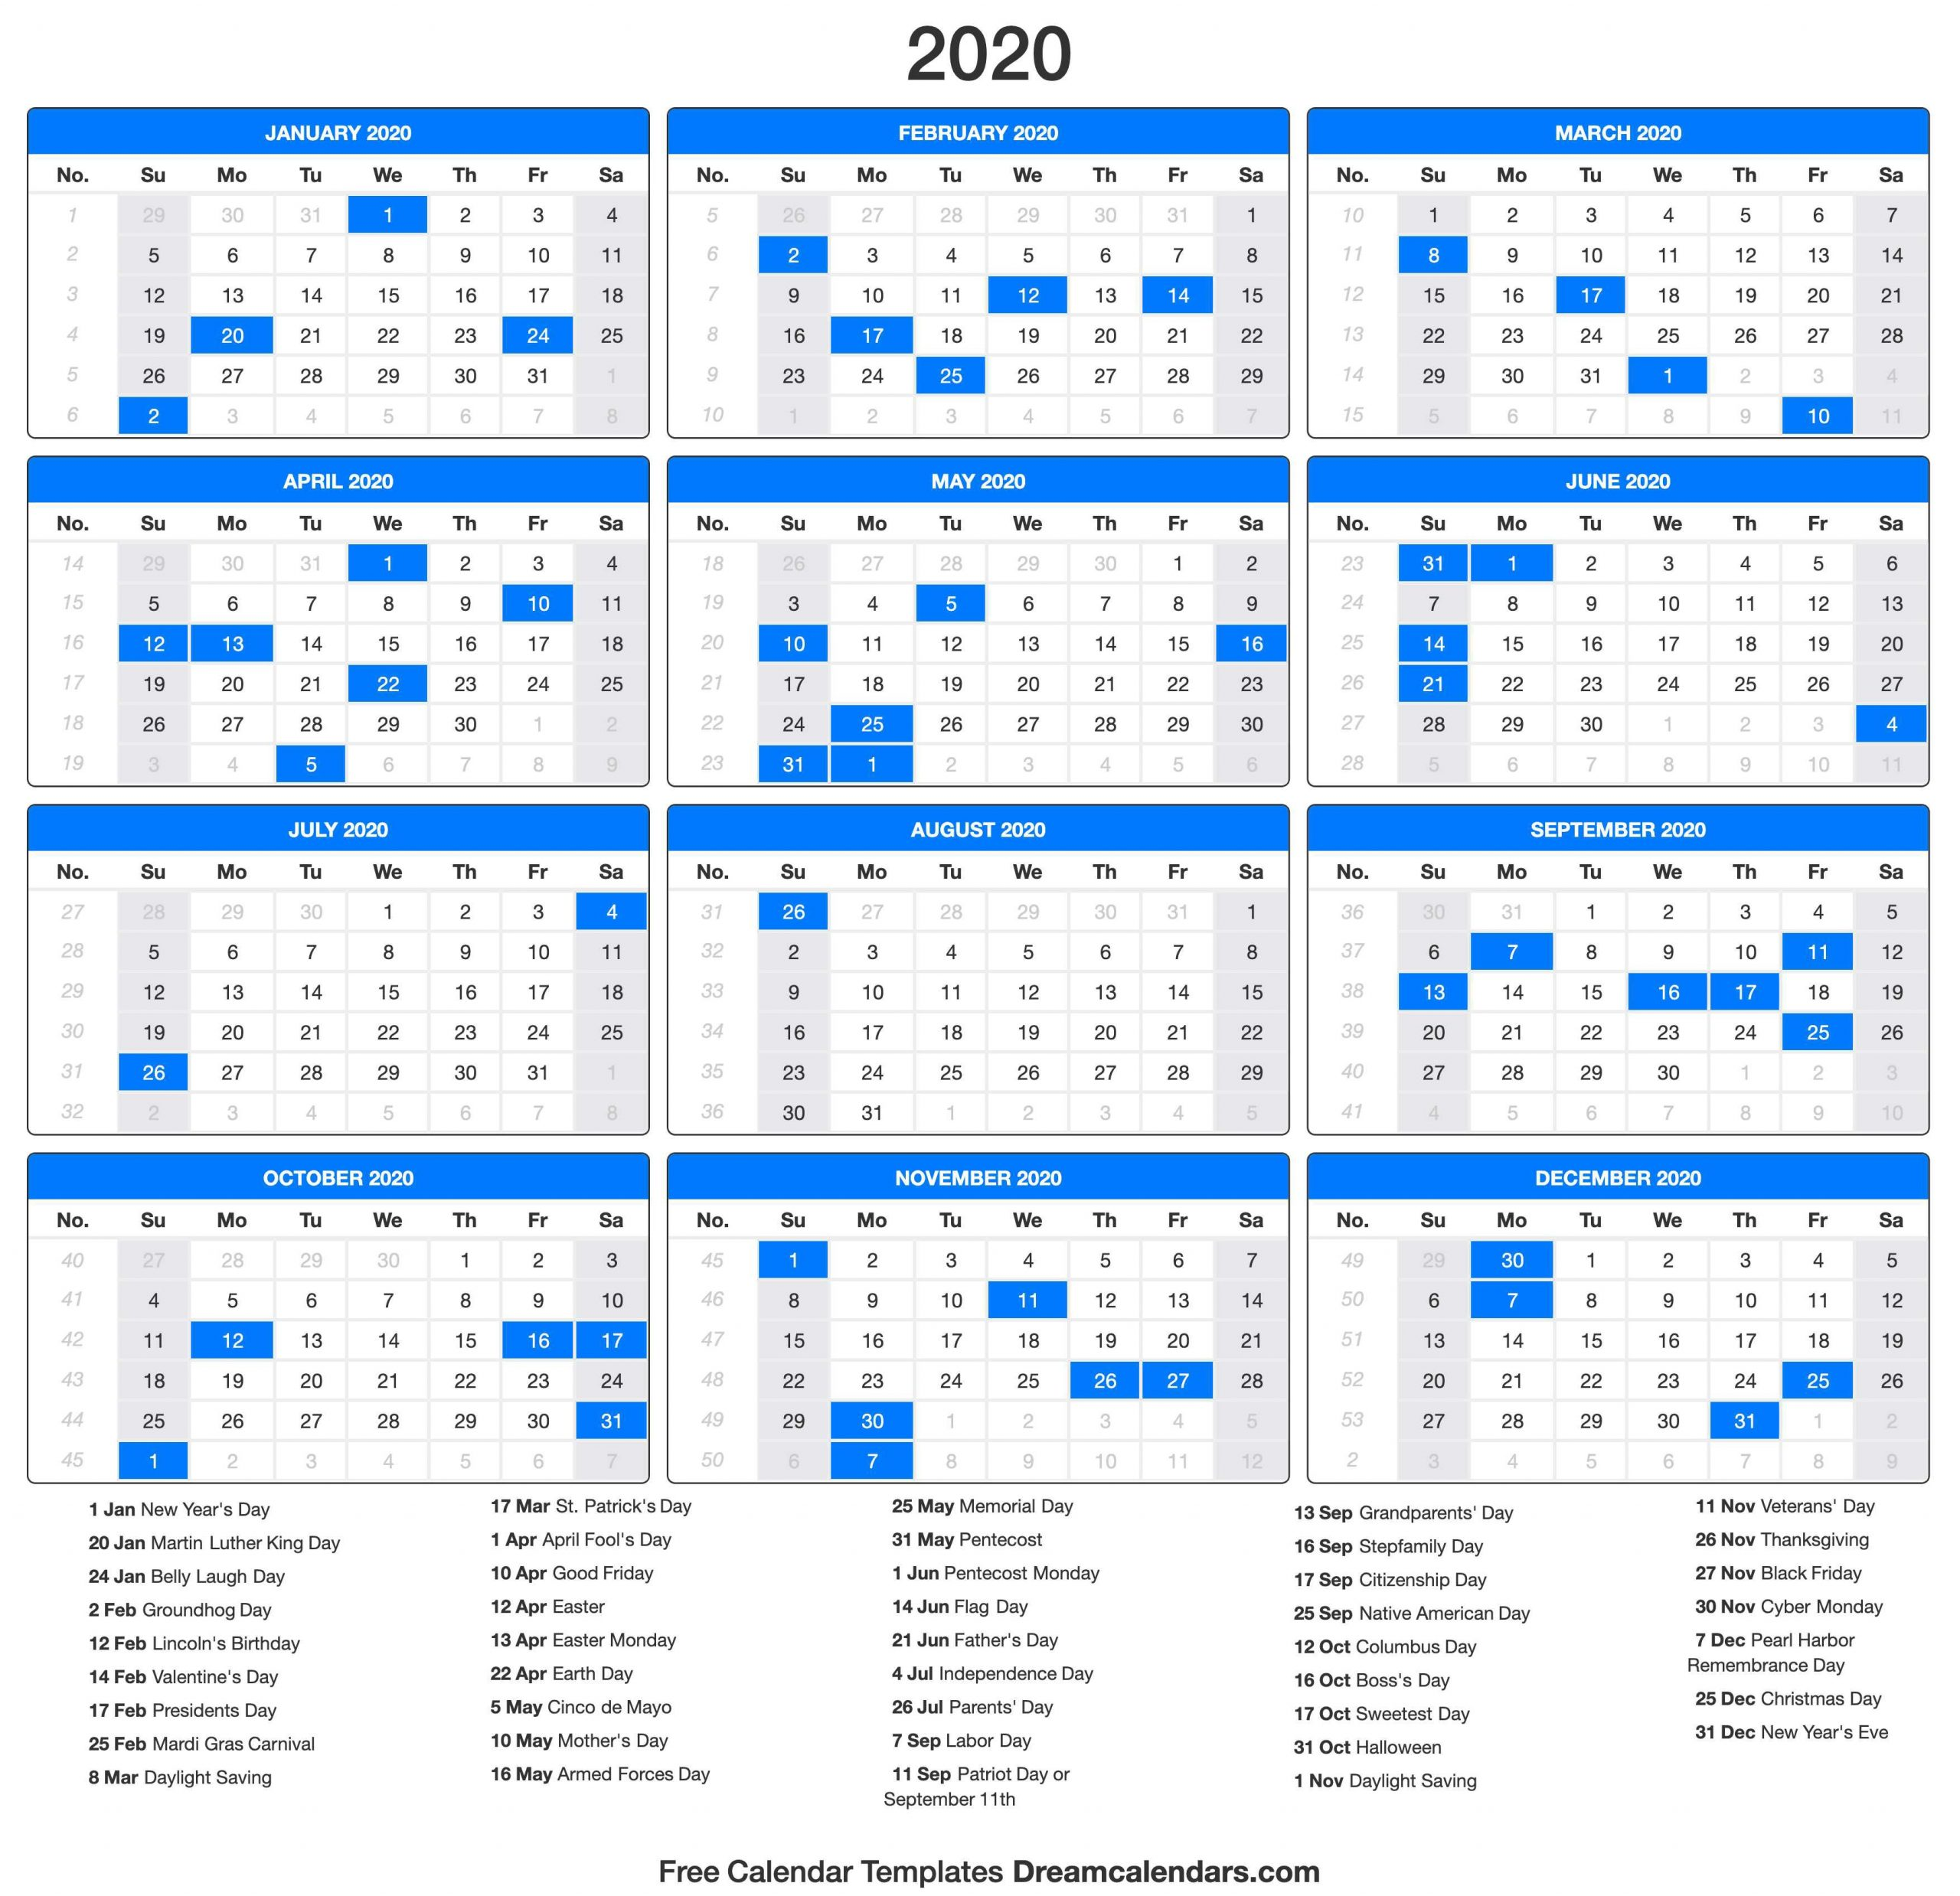 Yearly 2020 Calendar Templates - Helena Orstem - Medium